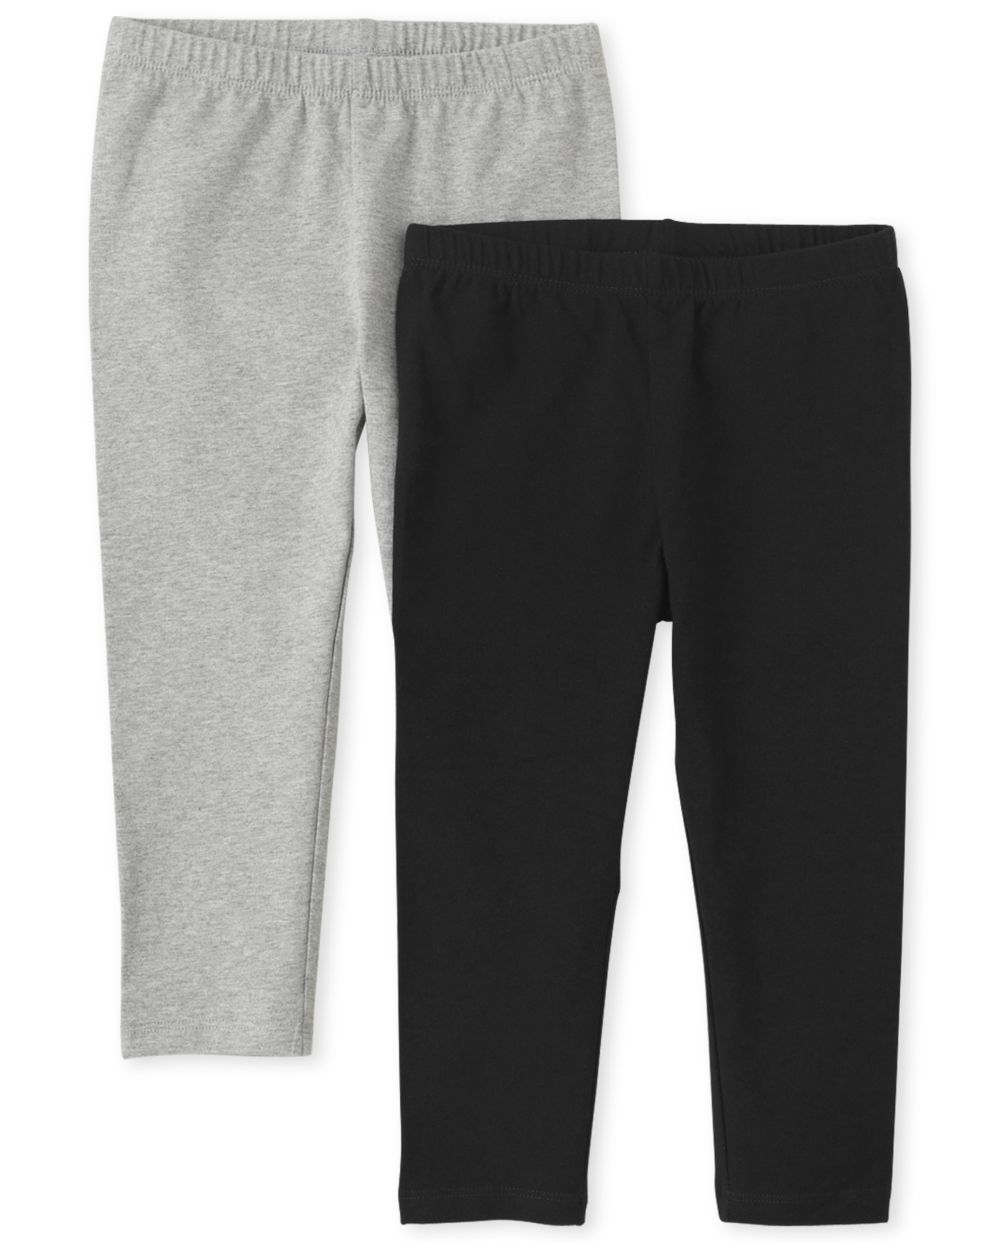 Girls Capri Leggings 2-Pack